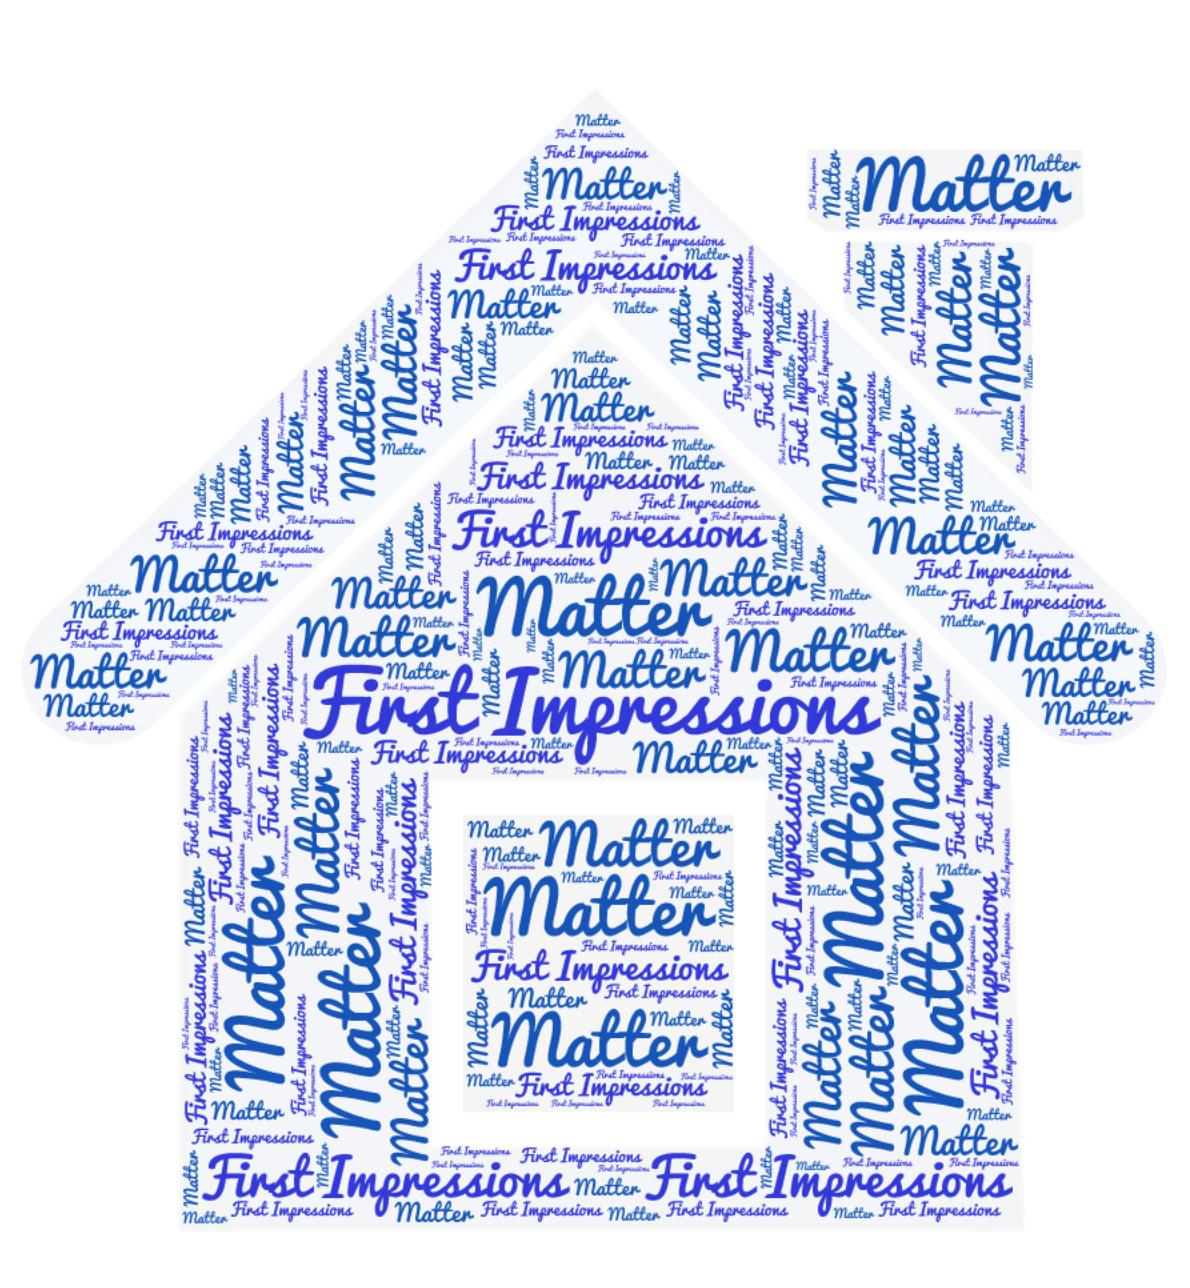 Boston Beacon Hill condos: First impressions matter